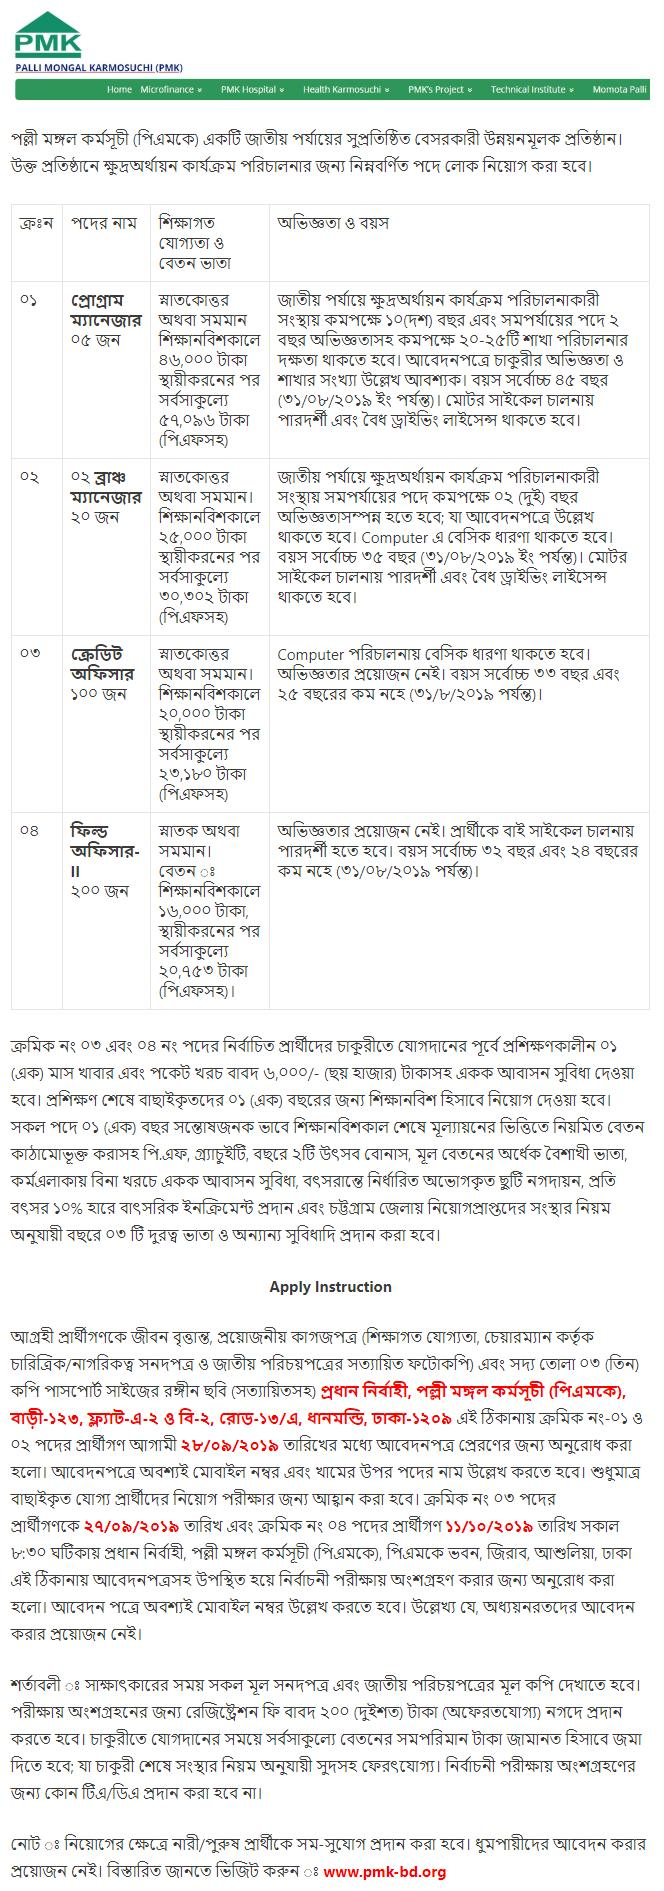 Palli Mangal Karmasuchi PMK job circular 2019 www pmk-bd.org